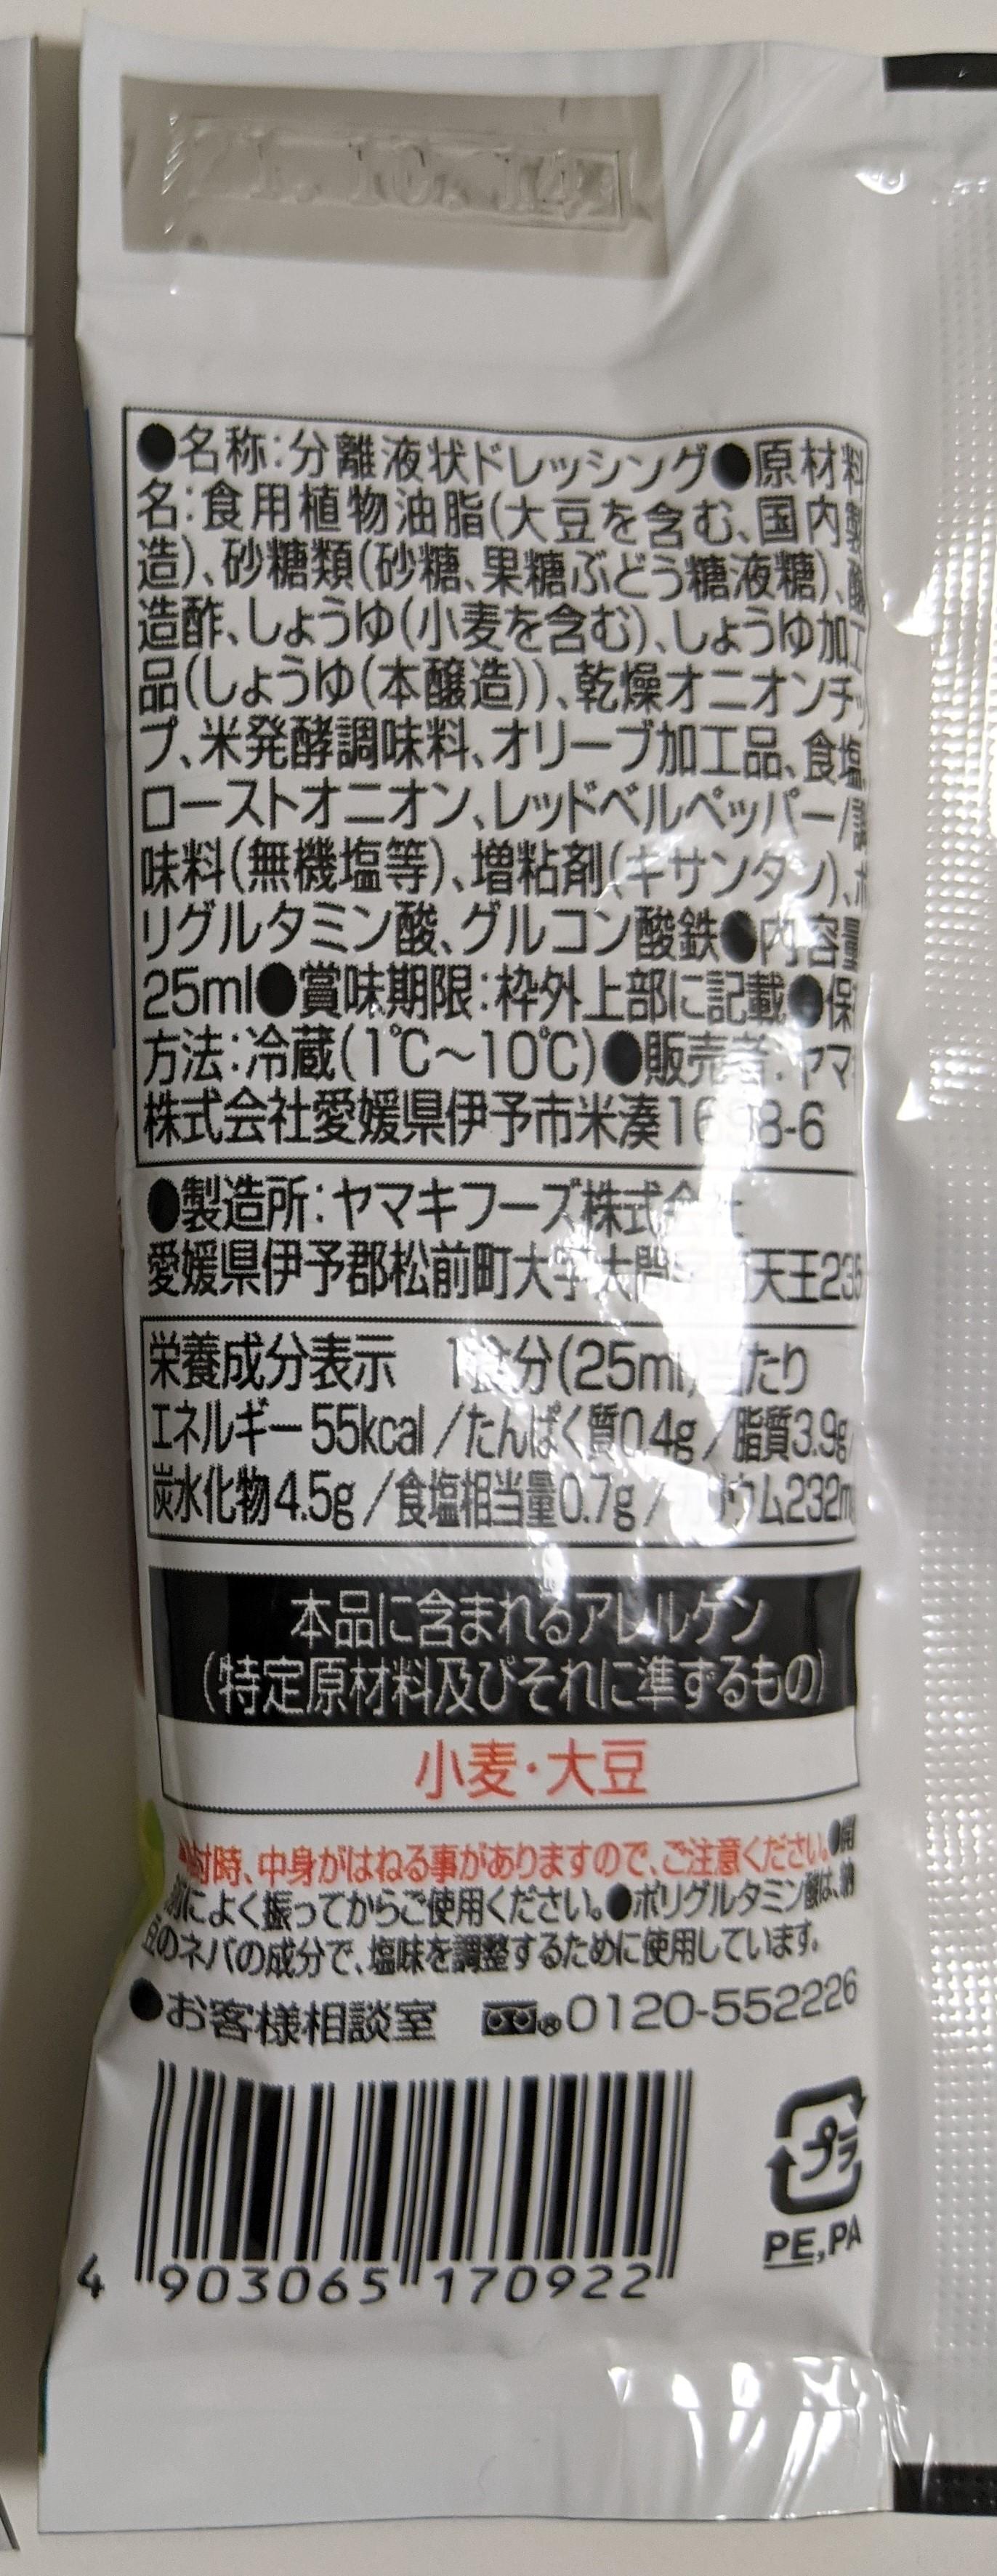 Family Mart Reduced-Sodium Japanese Dressing back of package